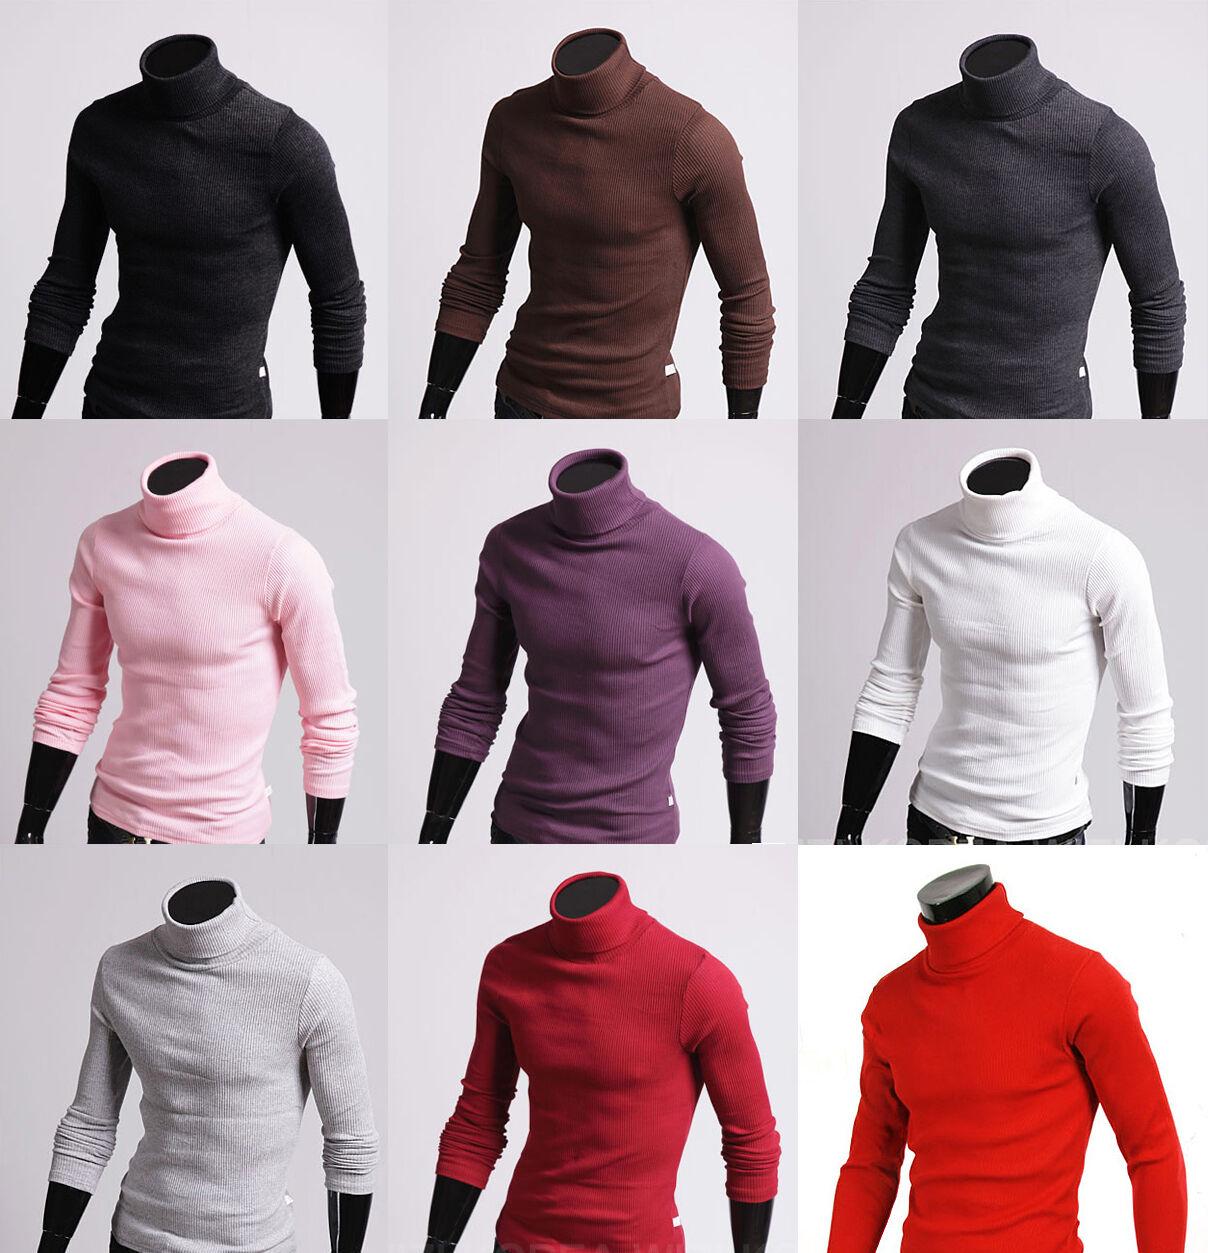 New mens turtleneck sweater shirts Cotton polo neck stretch jumper UK S M L